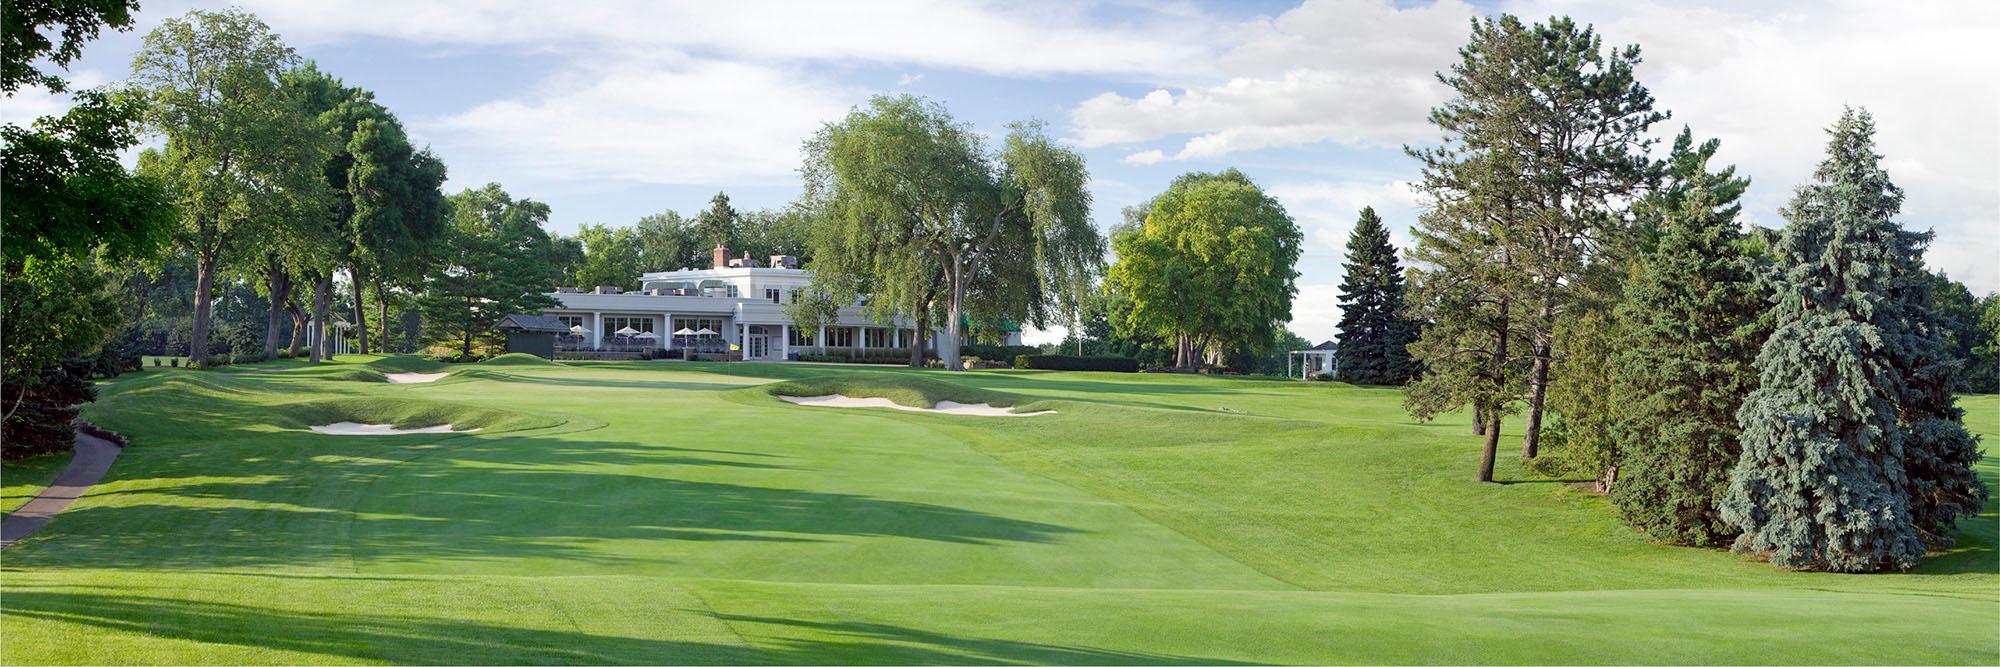 Minneapolis Golf Club